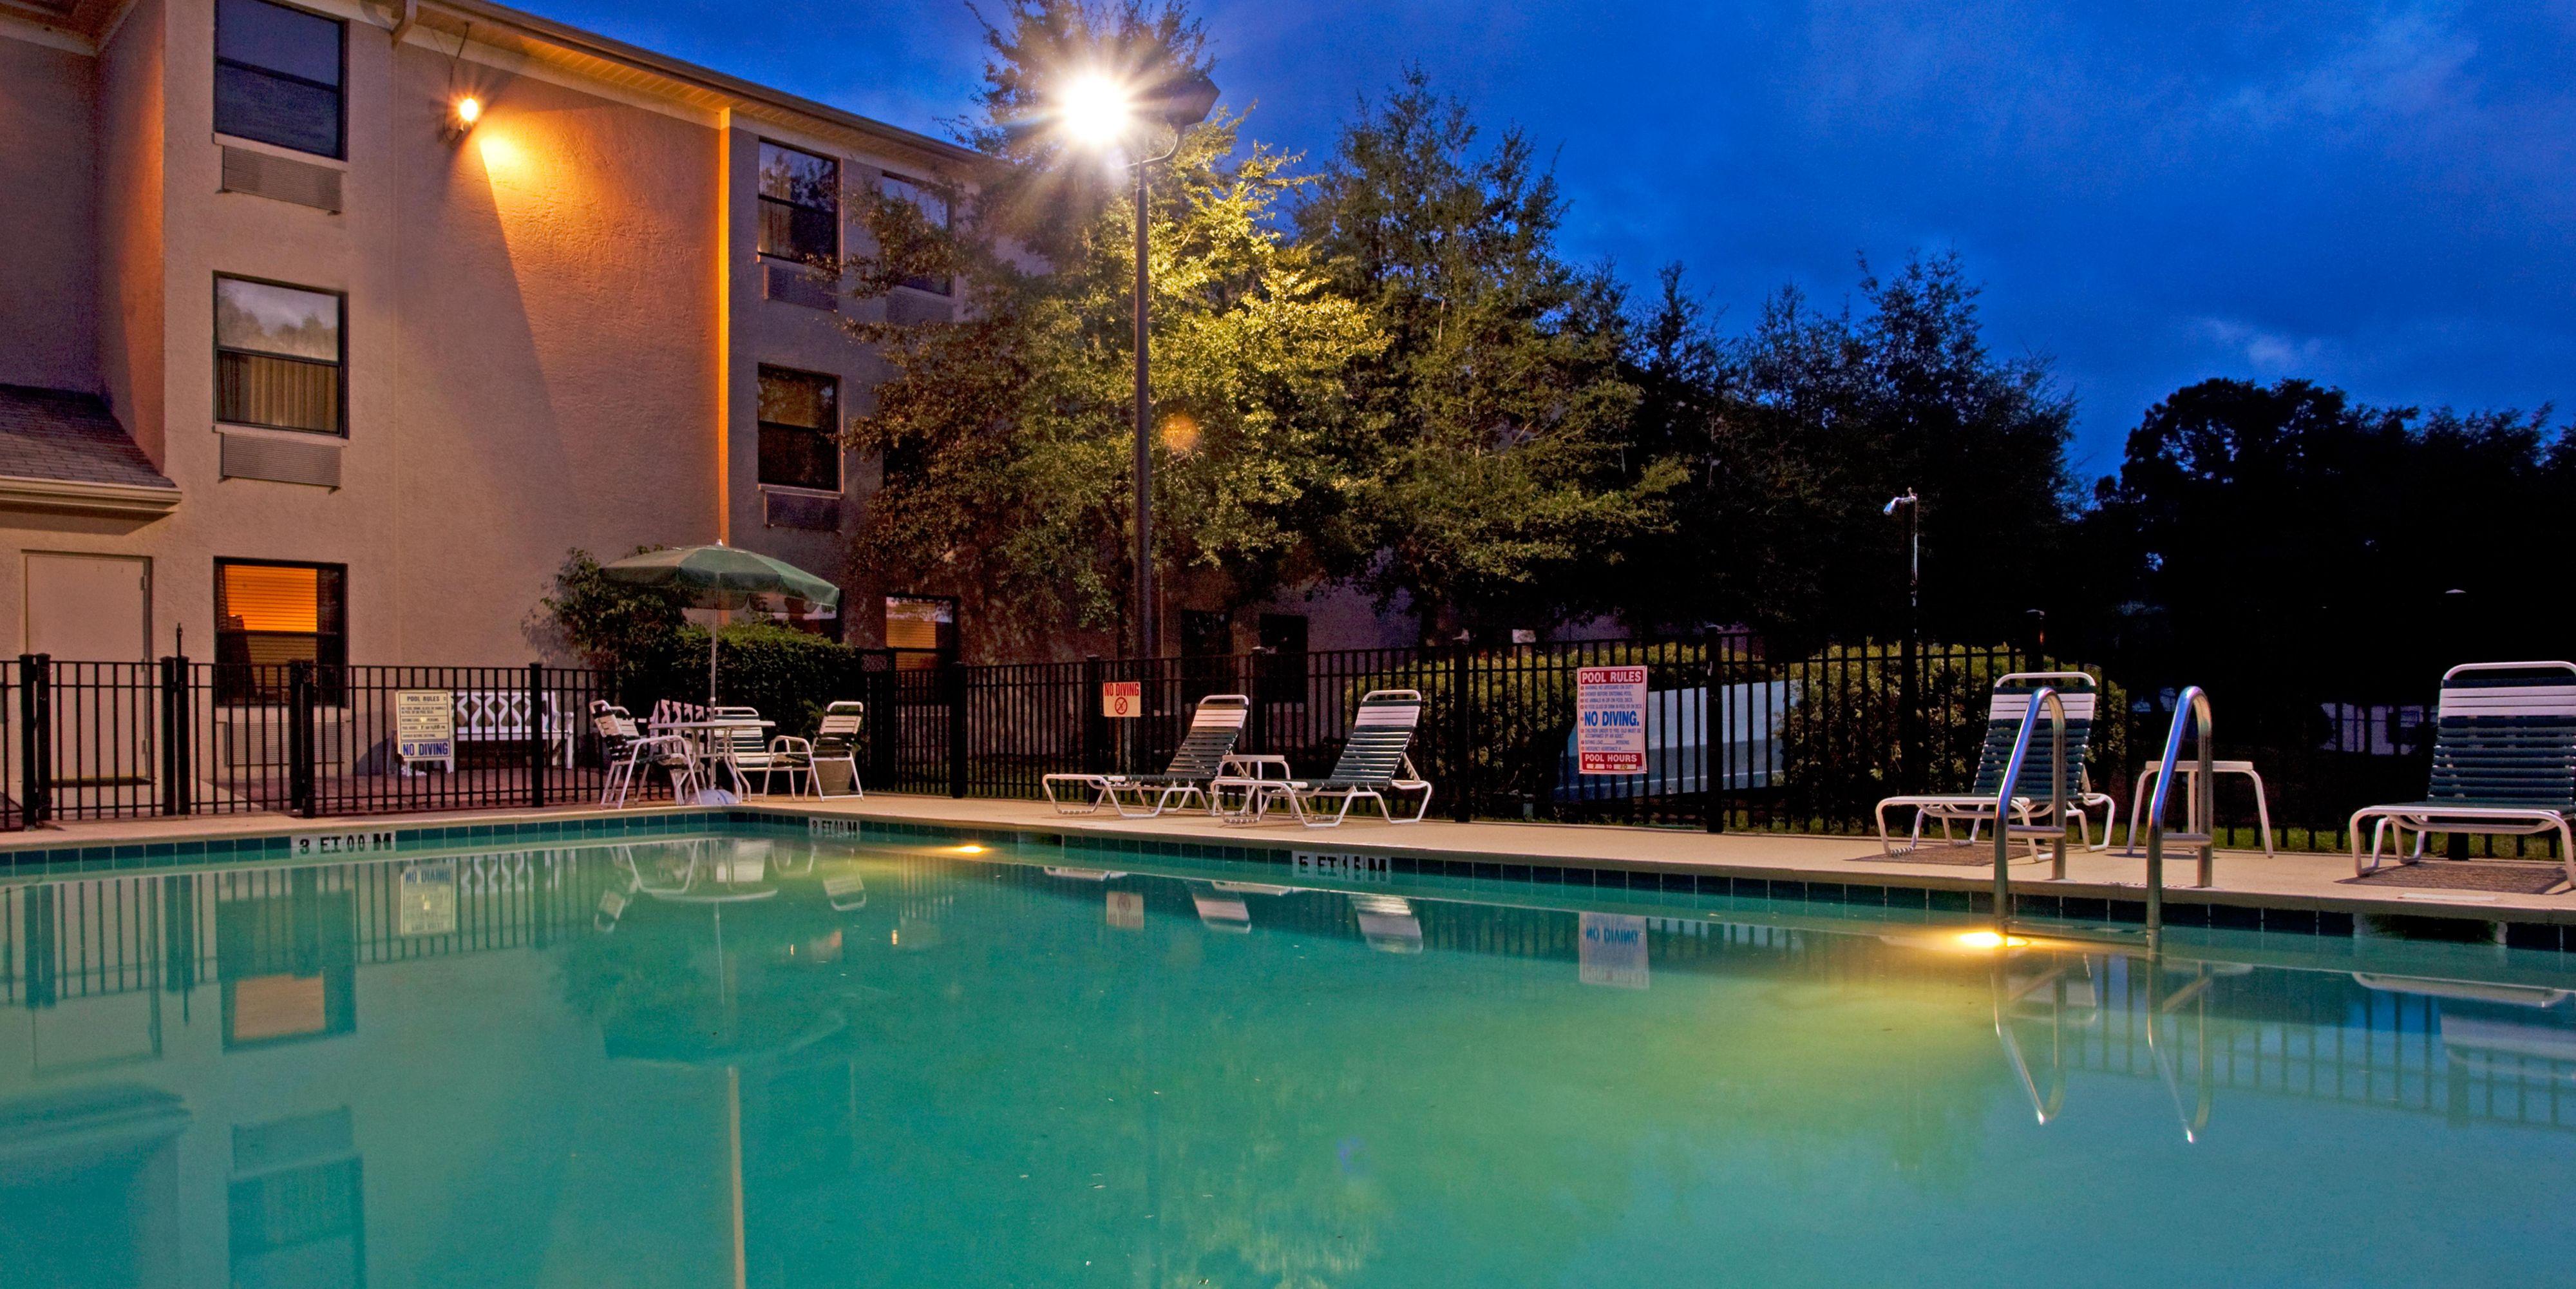 Holiday Inn Express Ocala 4291902752 2x1